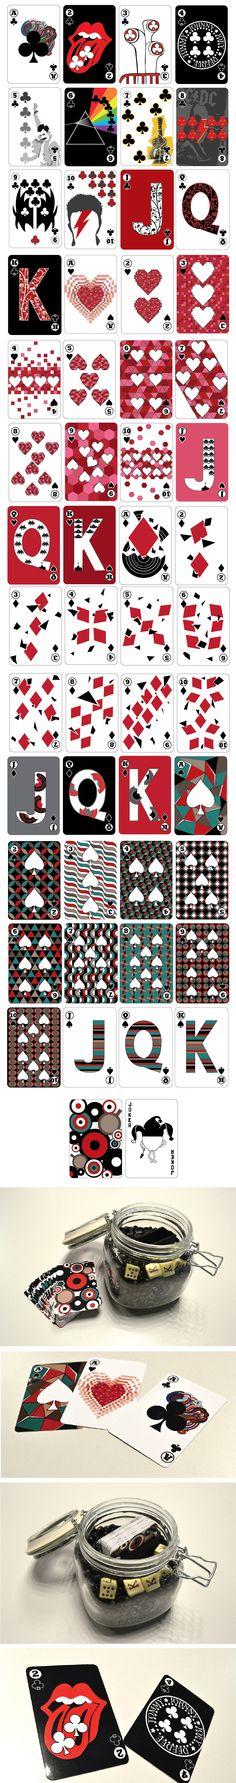 Diseño baraja de cartas (70's, música, café)